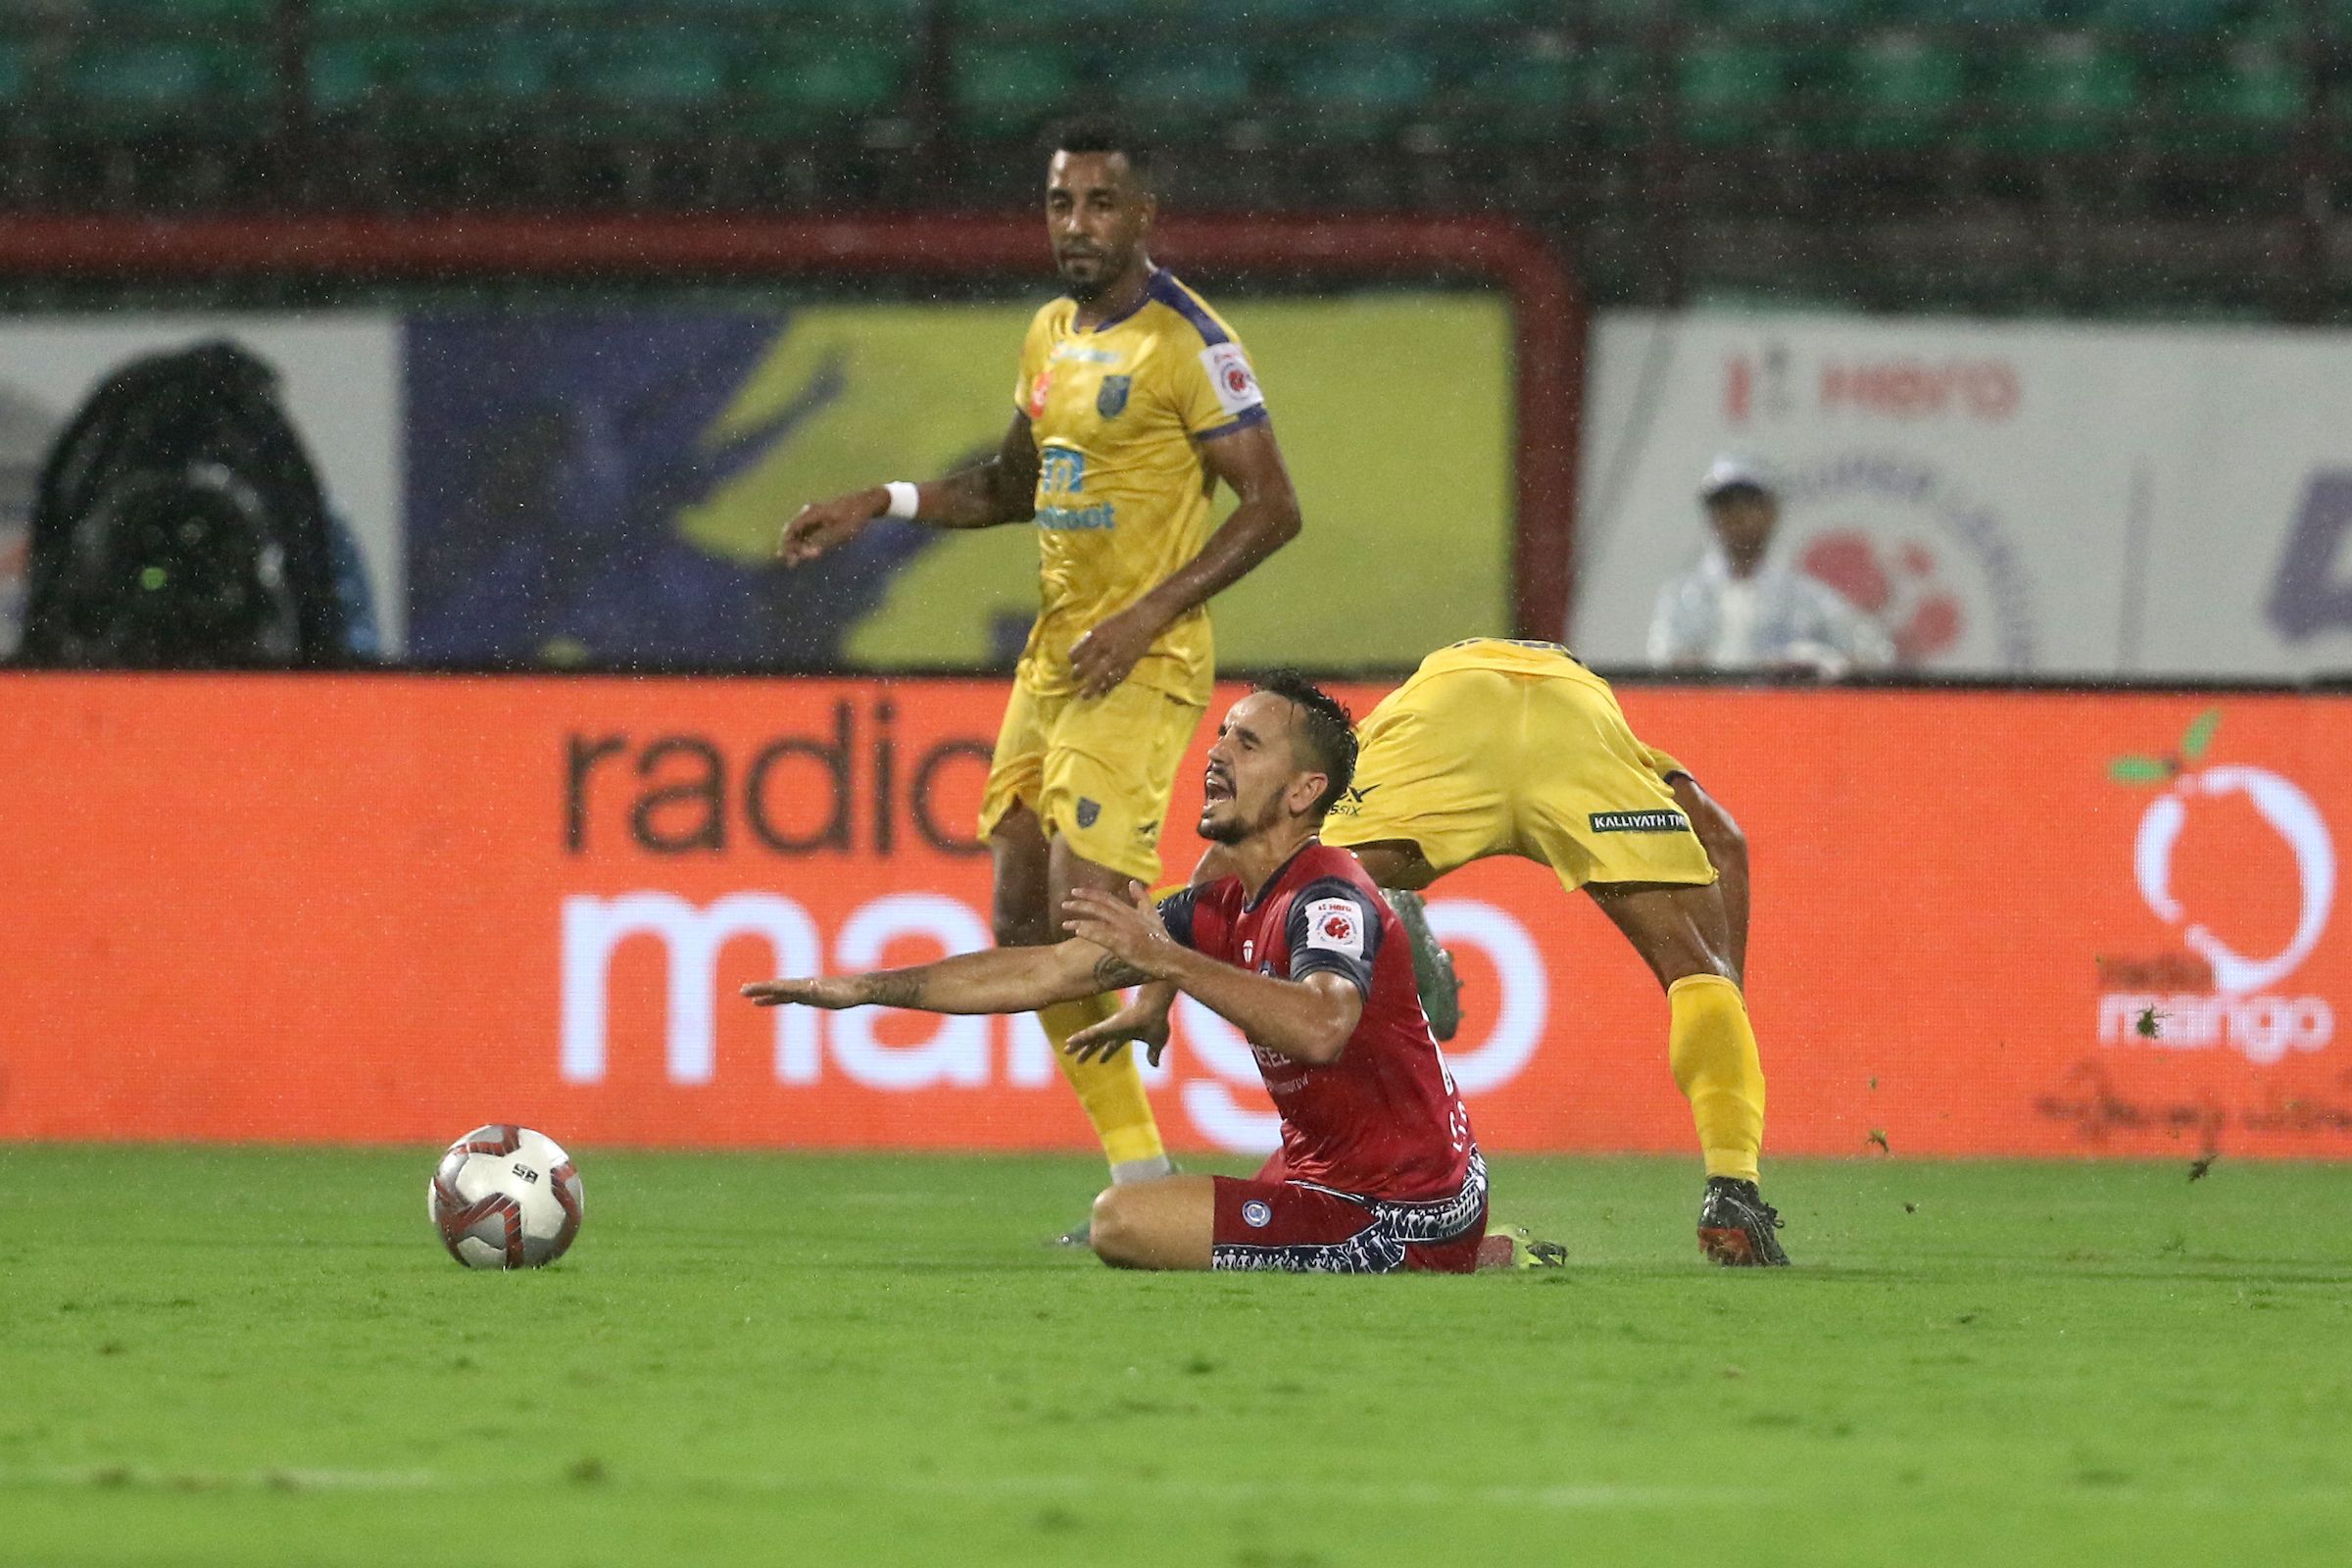 Carlos Calvo Jamshedpur FC